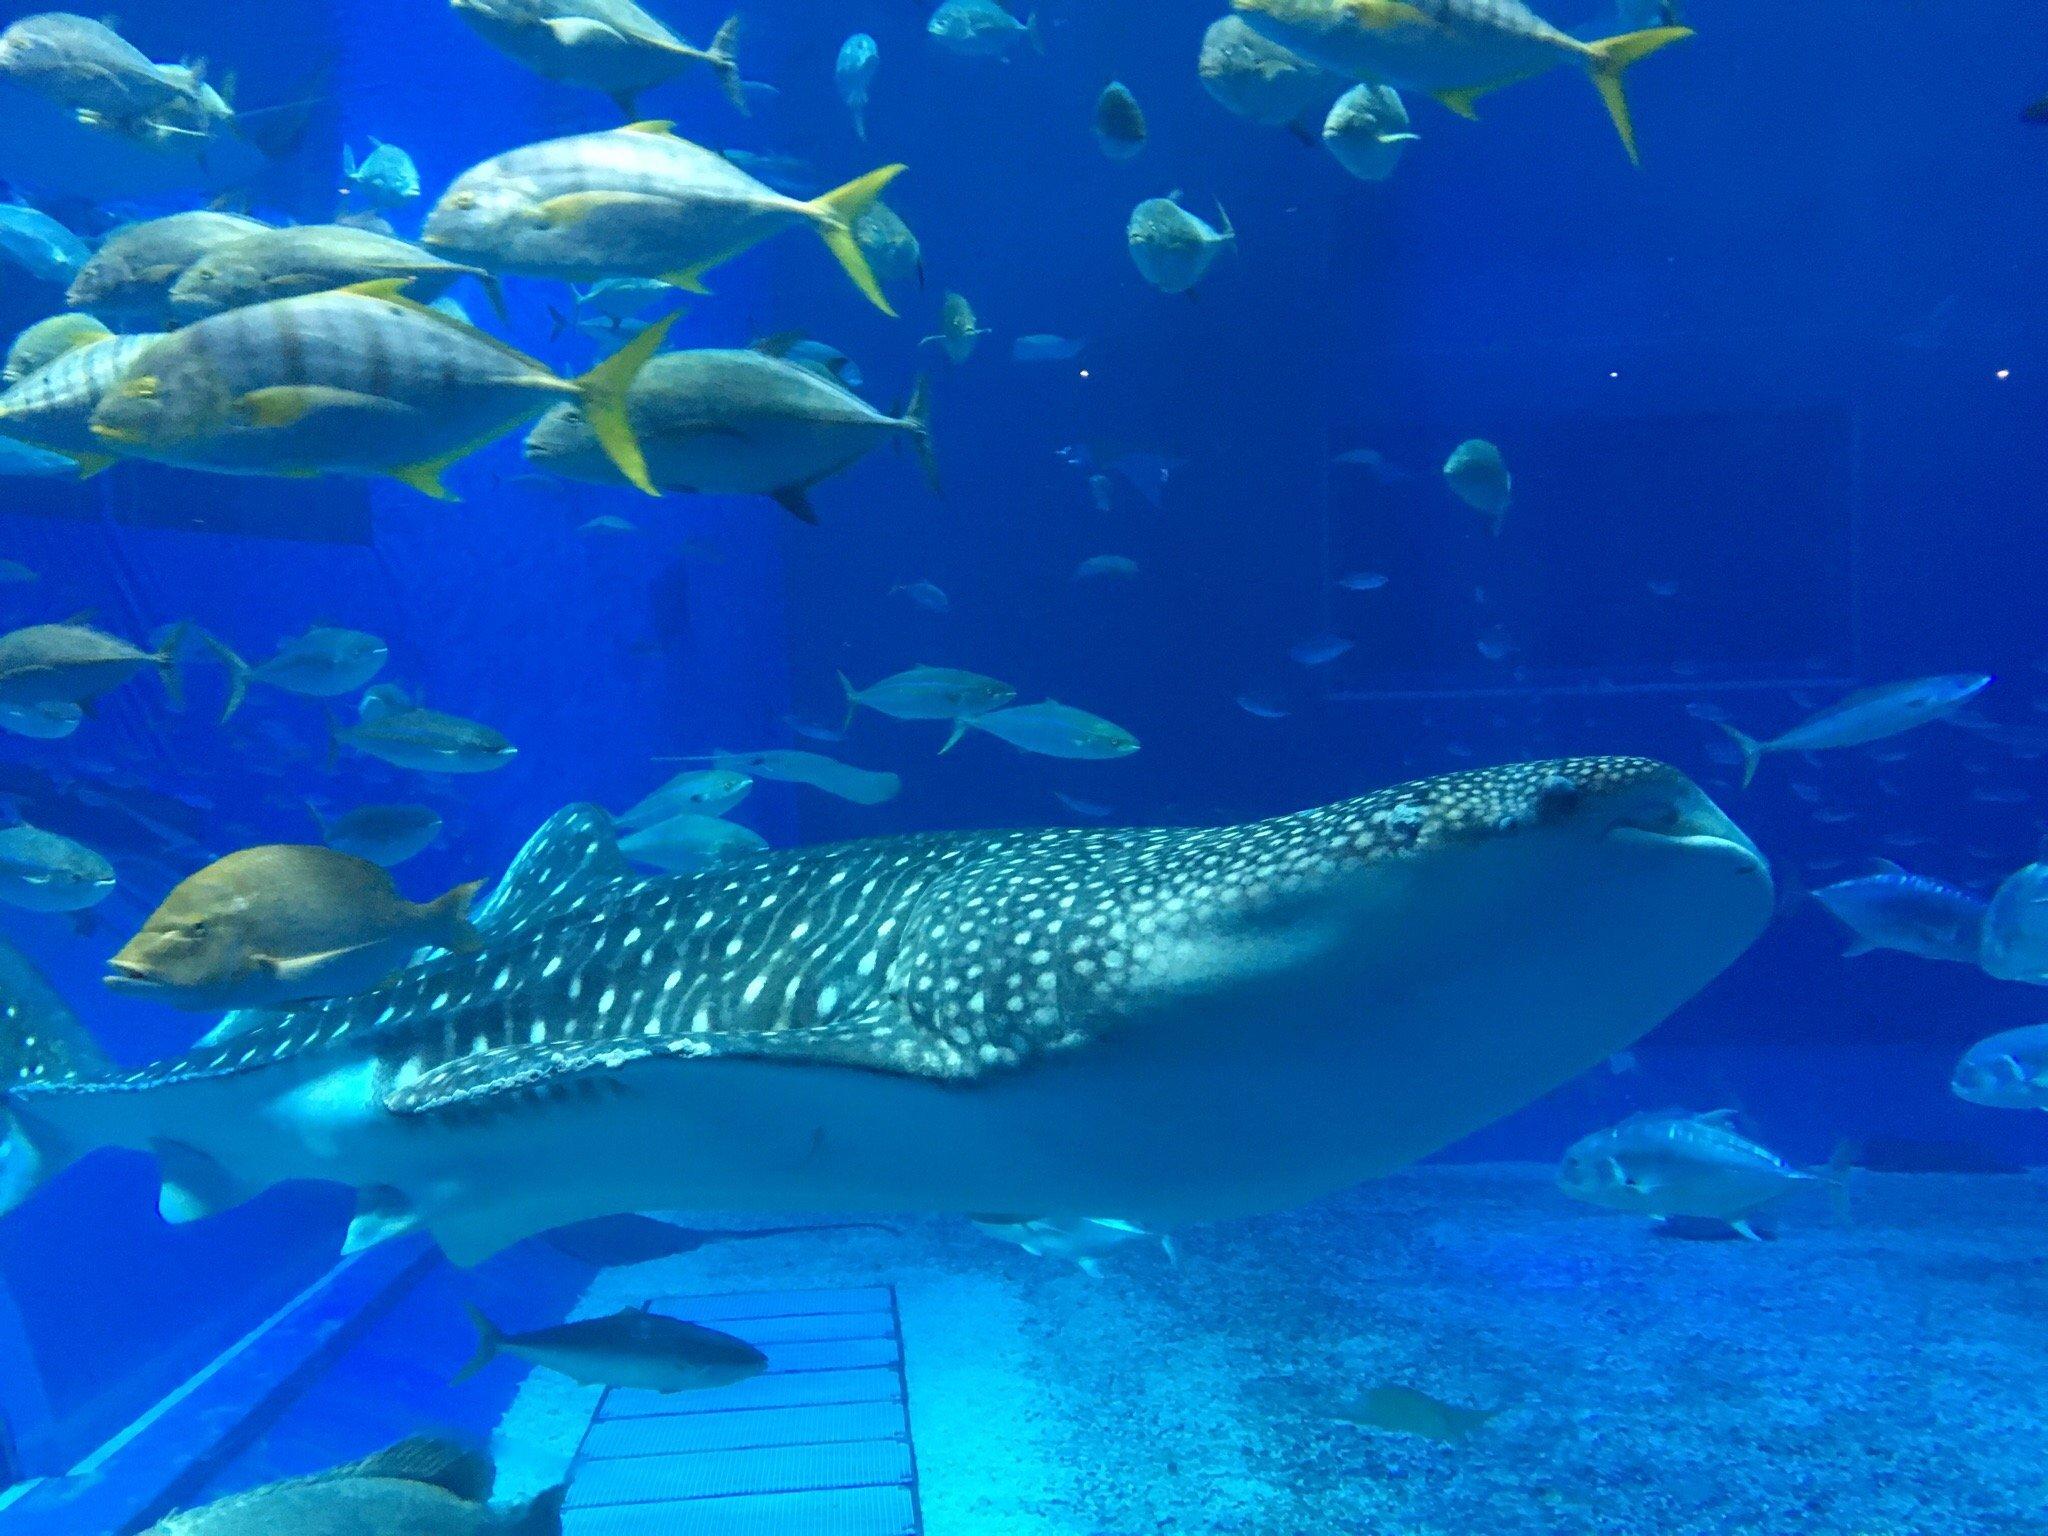 Okinawa Churaumi Aquarium (Motobu-cho): from USD 603 - Top Tips Before You Go...